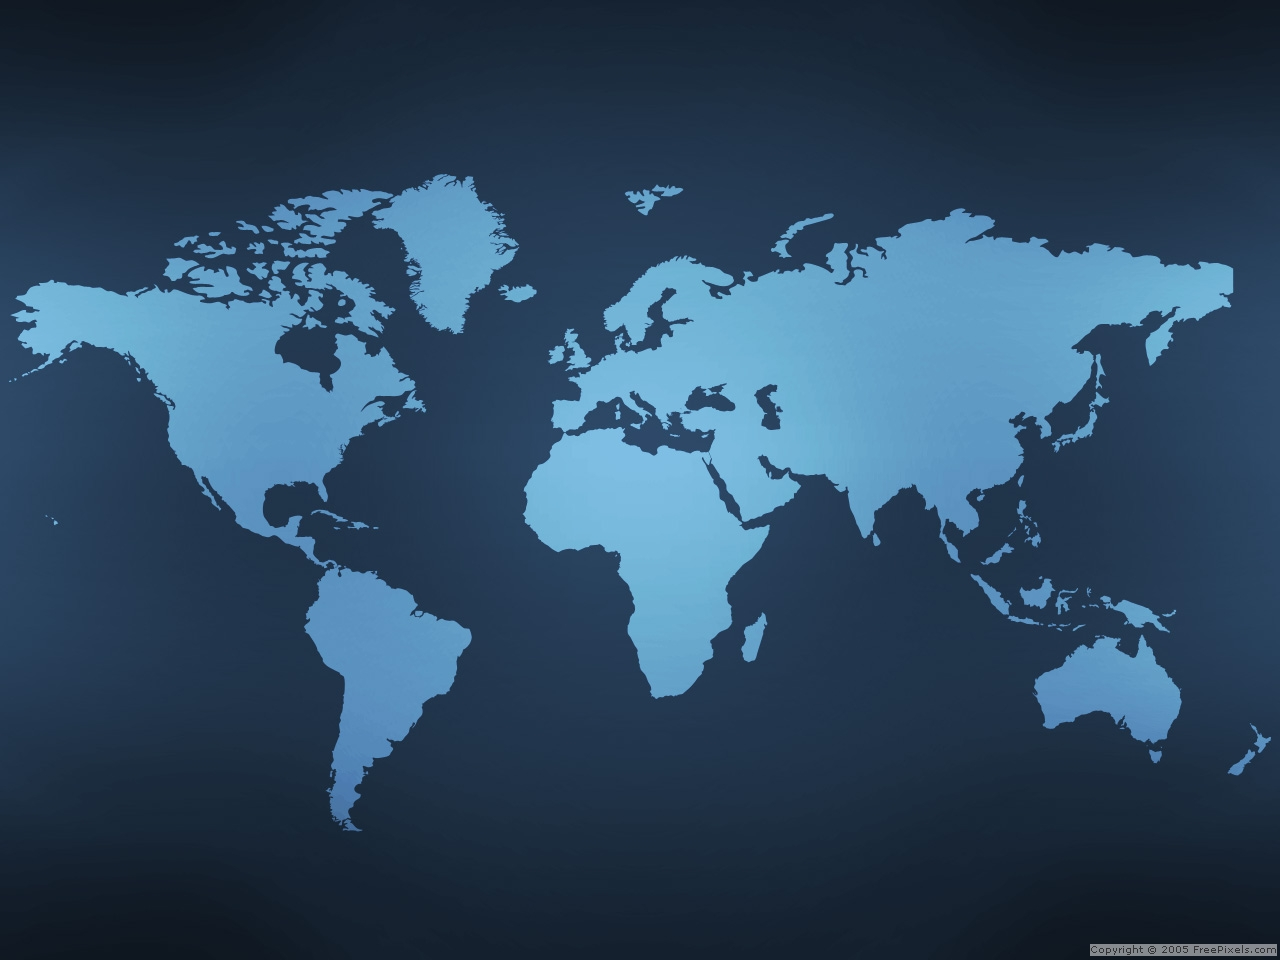 Cartograf Fr Cartes Des Pays Du Monde Page 5